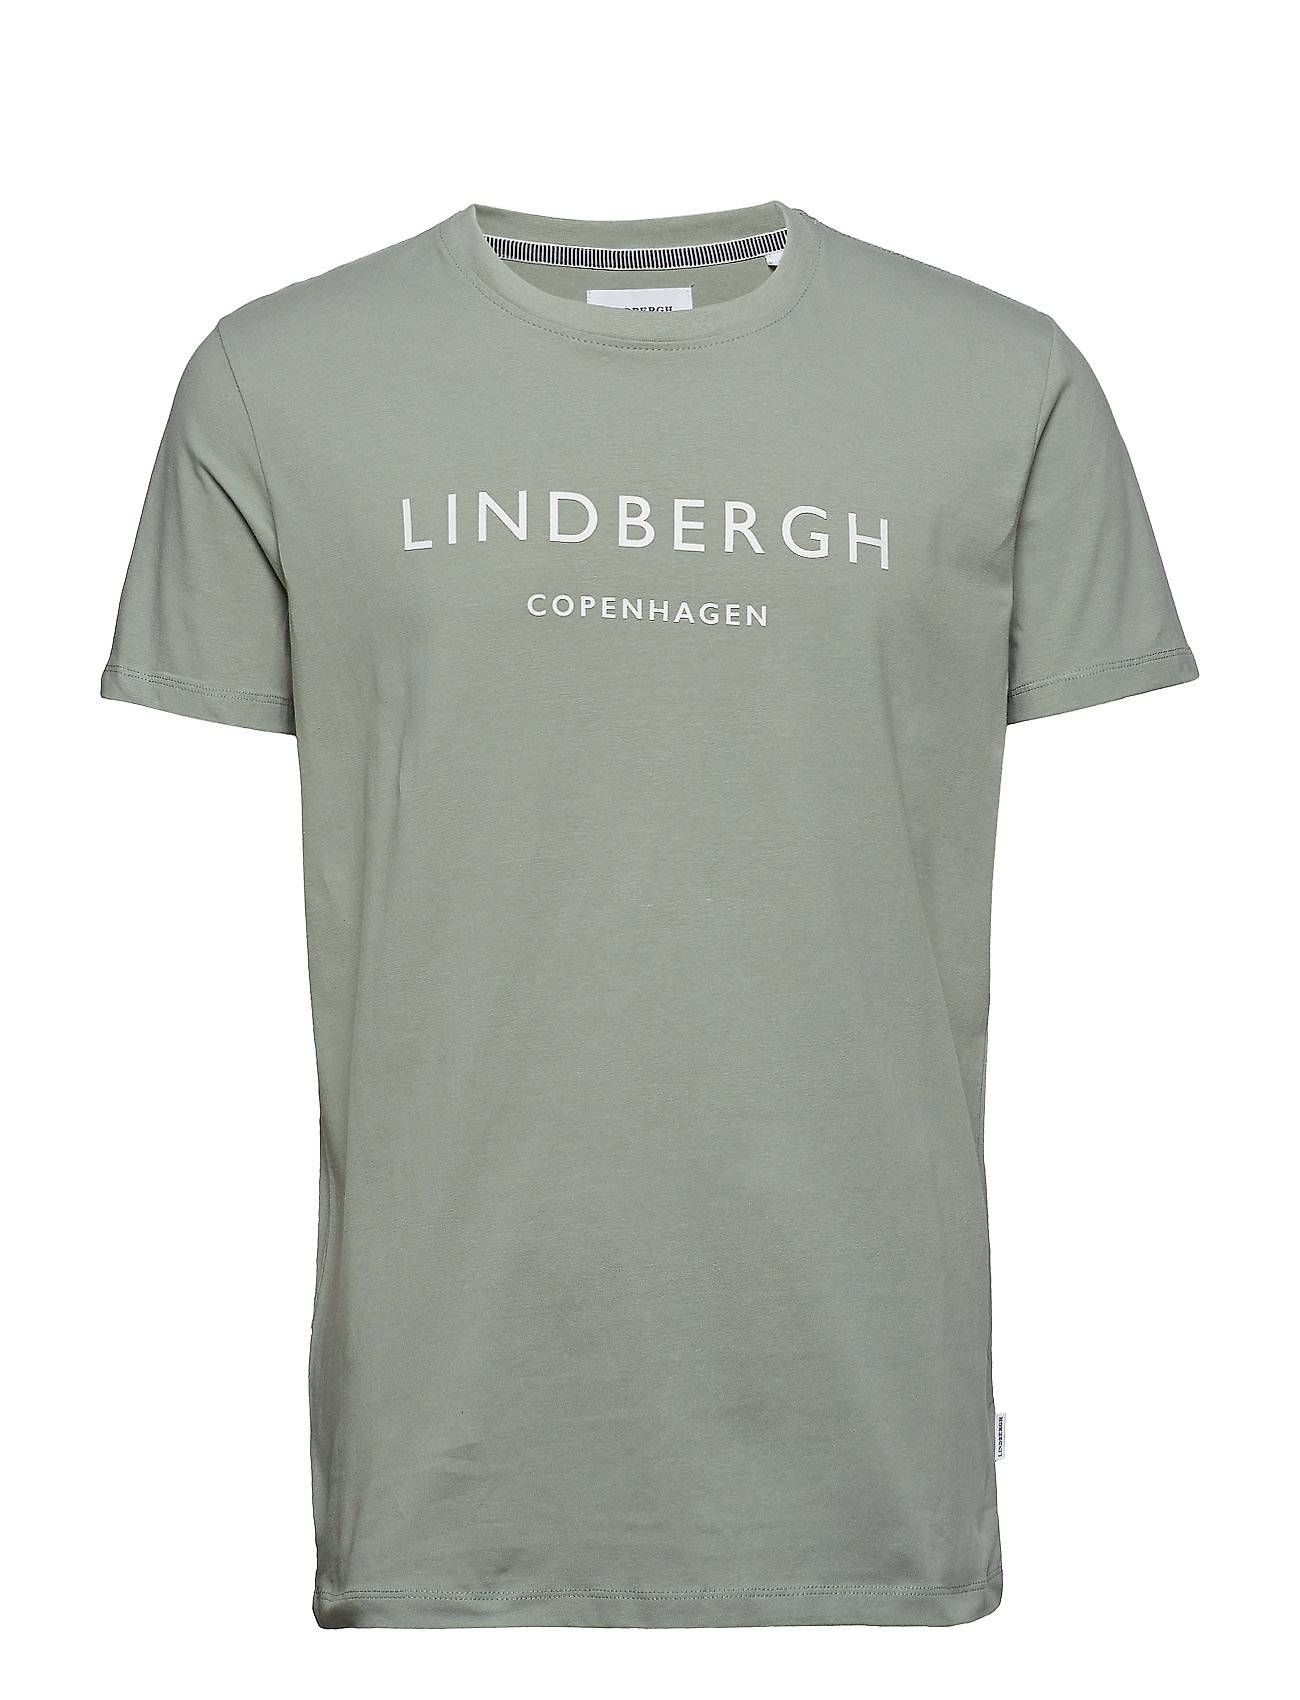 Lindbergh Mens Printed Crew-Neck Tee